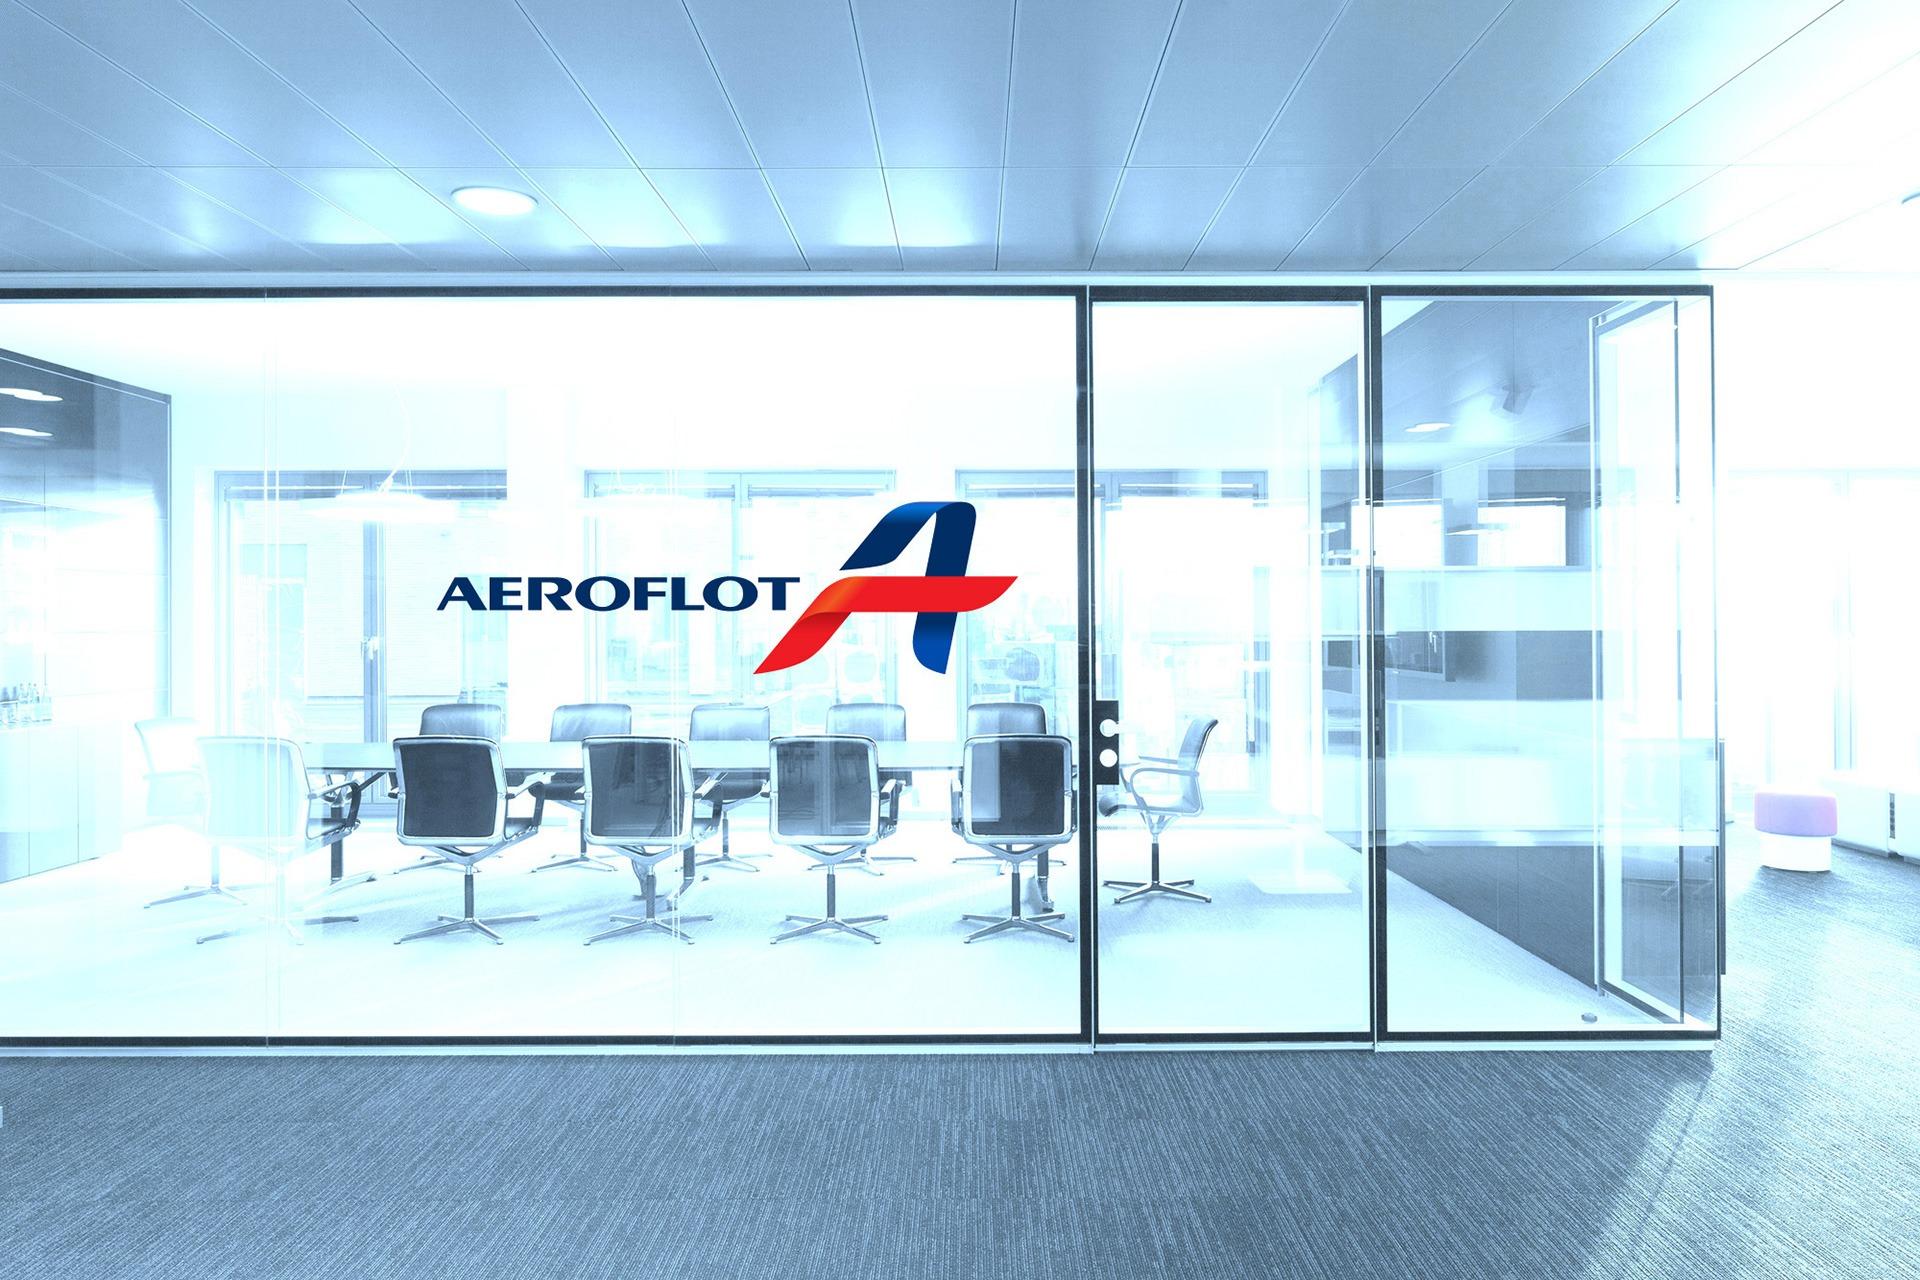 Брендинг, Фирменный стиль авиакомпании,, re-branding, ребрендинг авиакомпании, Asgard Branding, лого Аэрофлот, Aeroflot